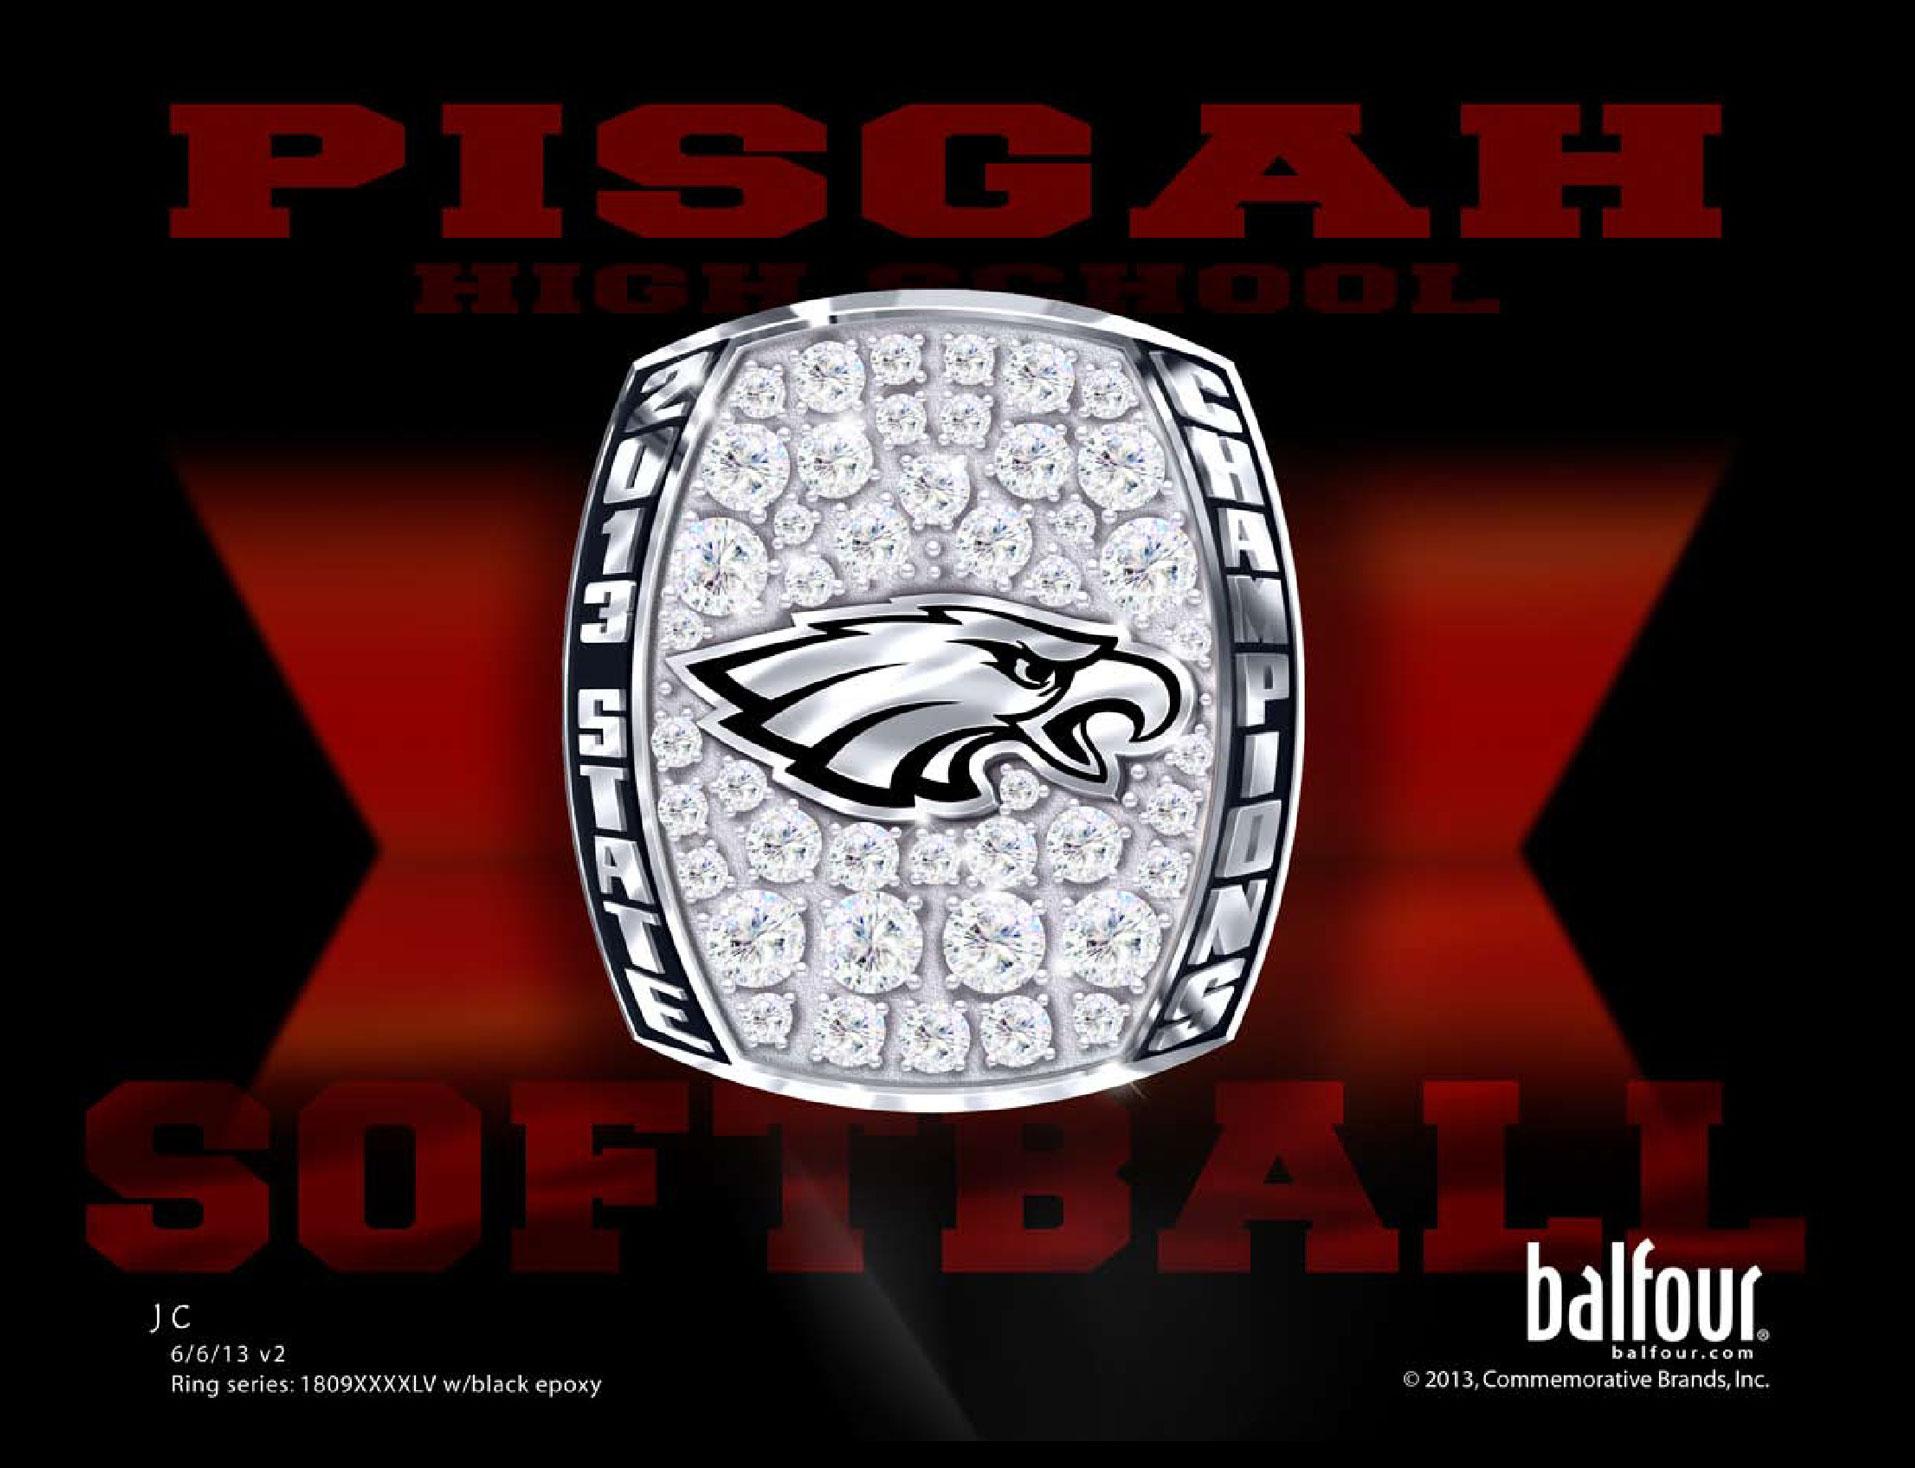 pisgah softball high school championship rings